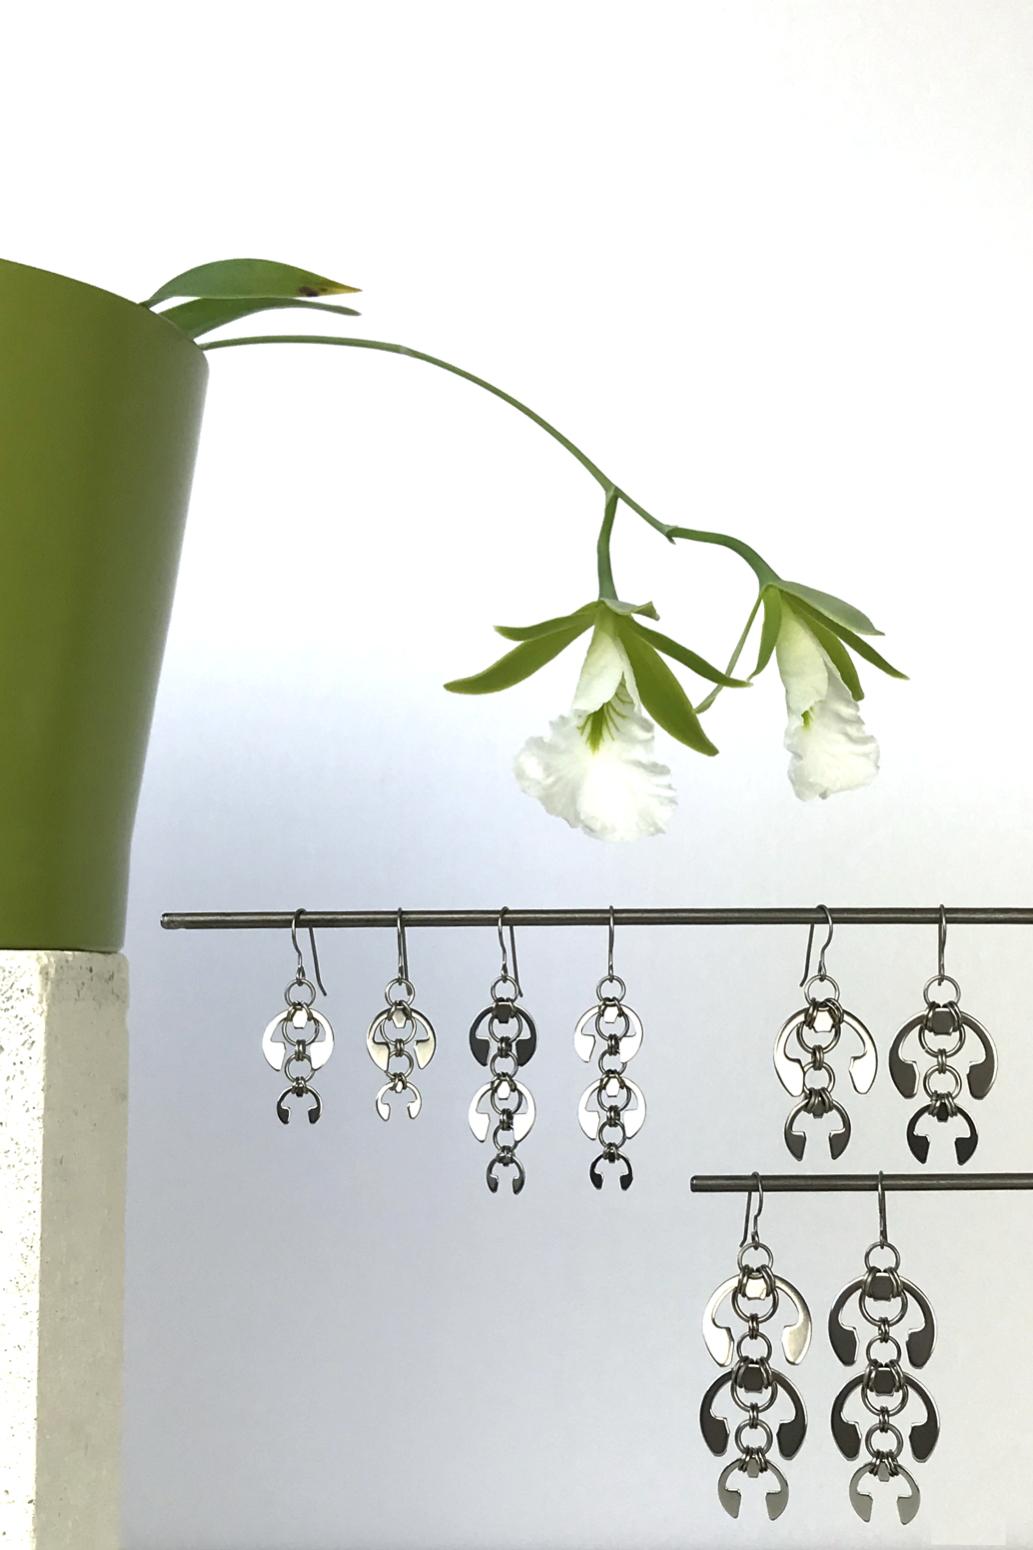 Wraptillion's Short Fuchsia Earrings, Long Fuchsia Earrings, Hops Earrings, and Laburnum Earrings with blooming orchid Encyclia mariae.